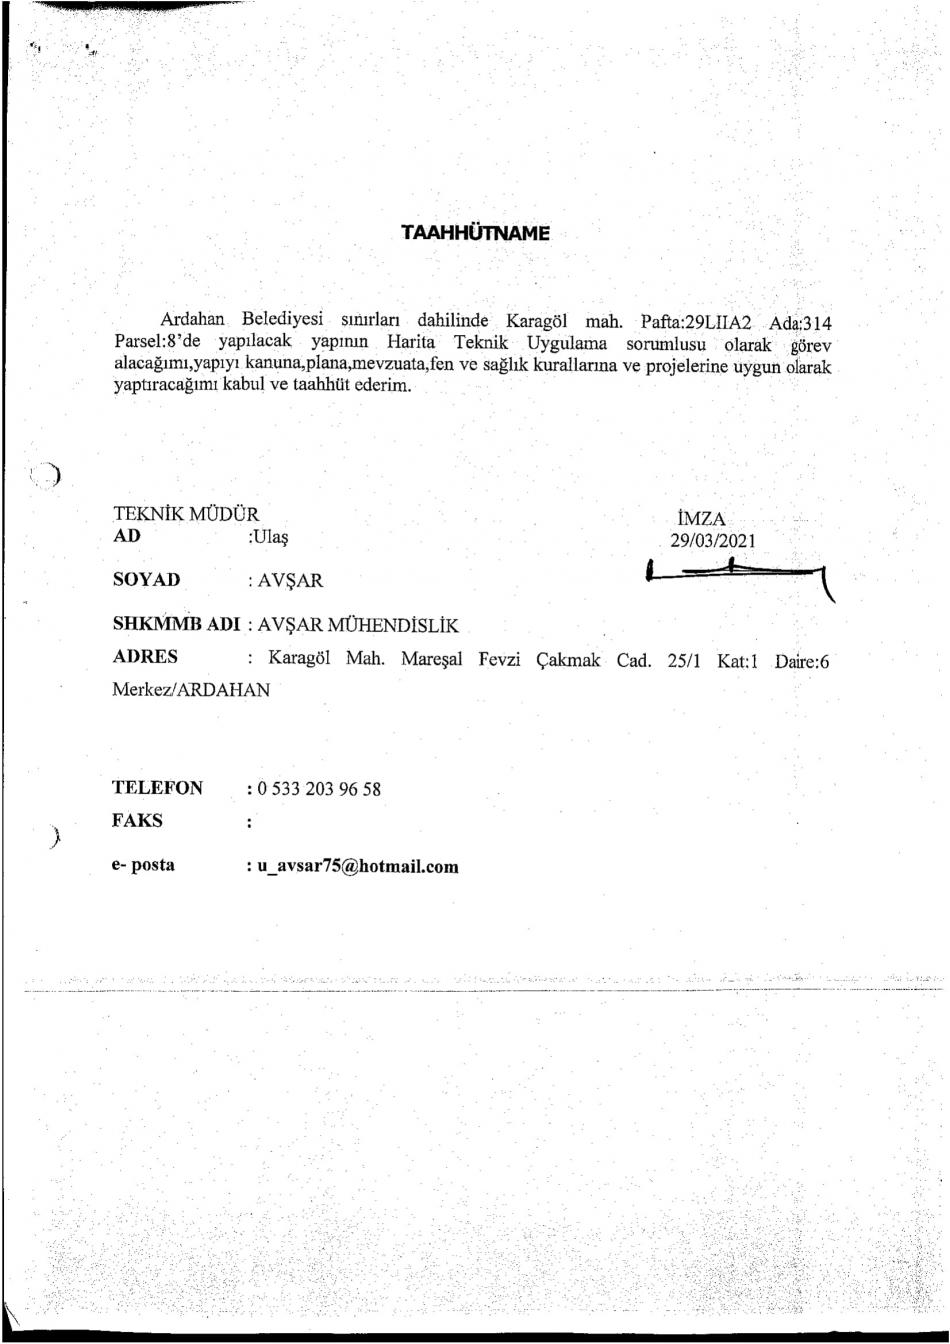 2021/07/1625924732_sebahattin_gundogdu_ardahan_bina_insaat_-4.jpg